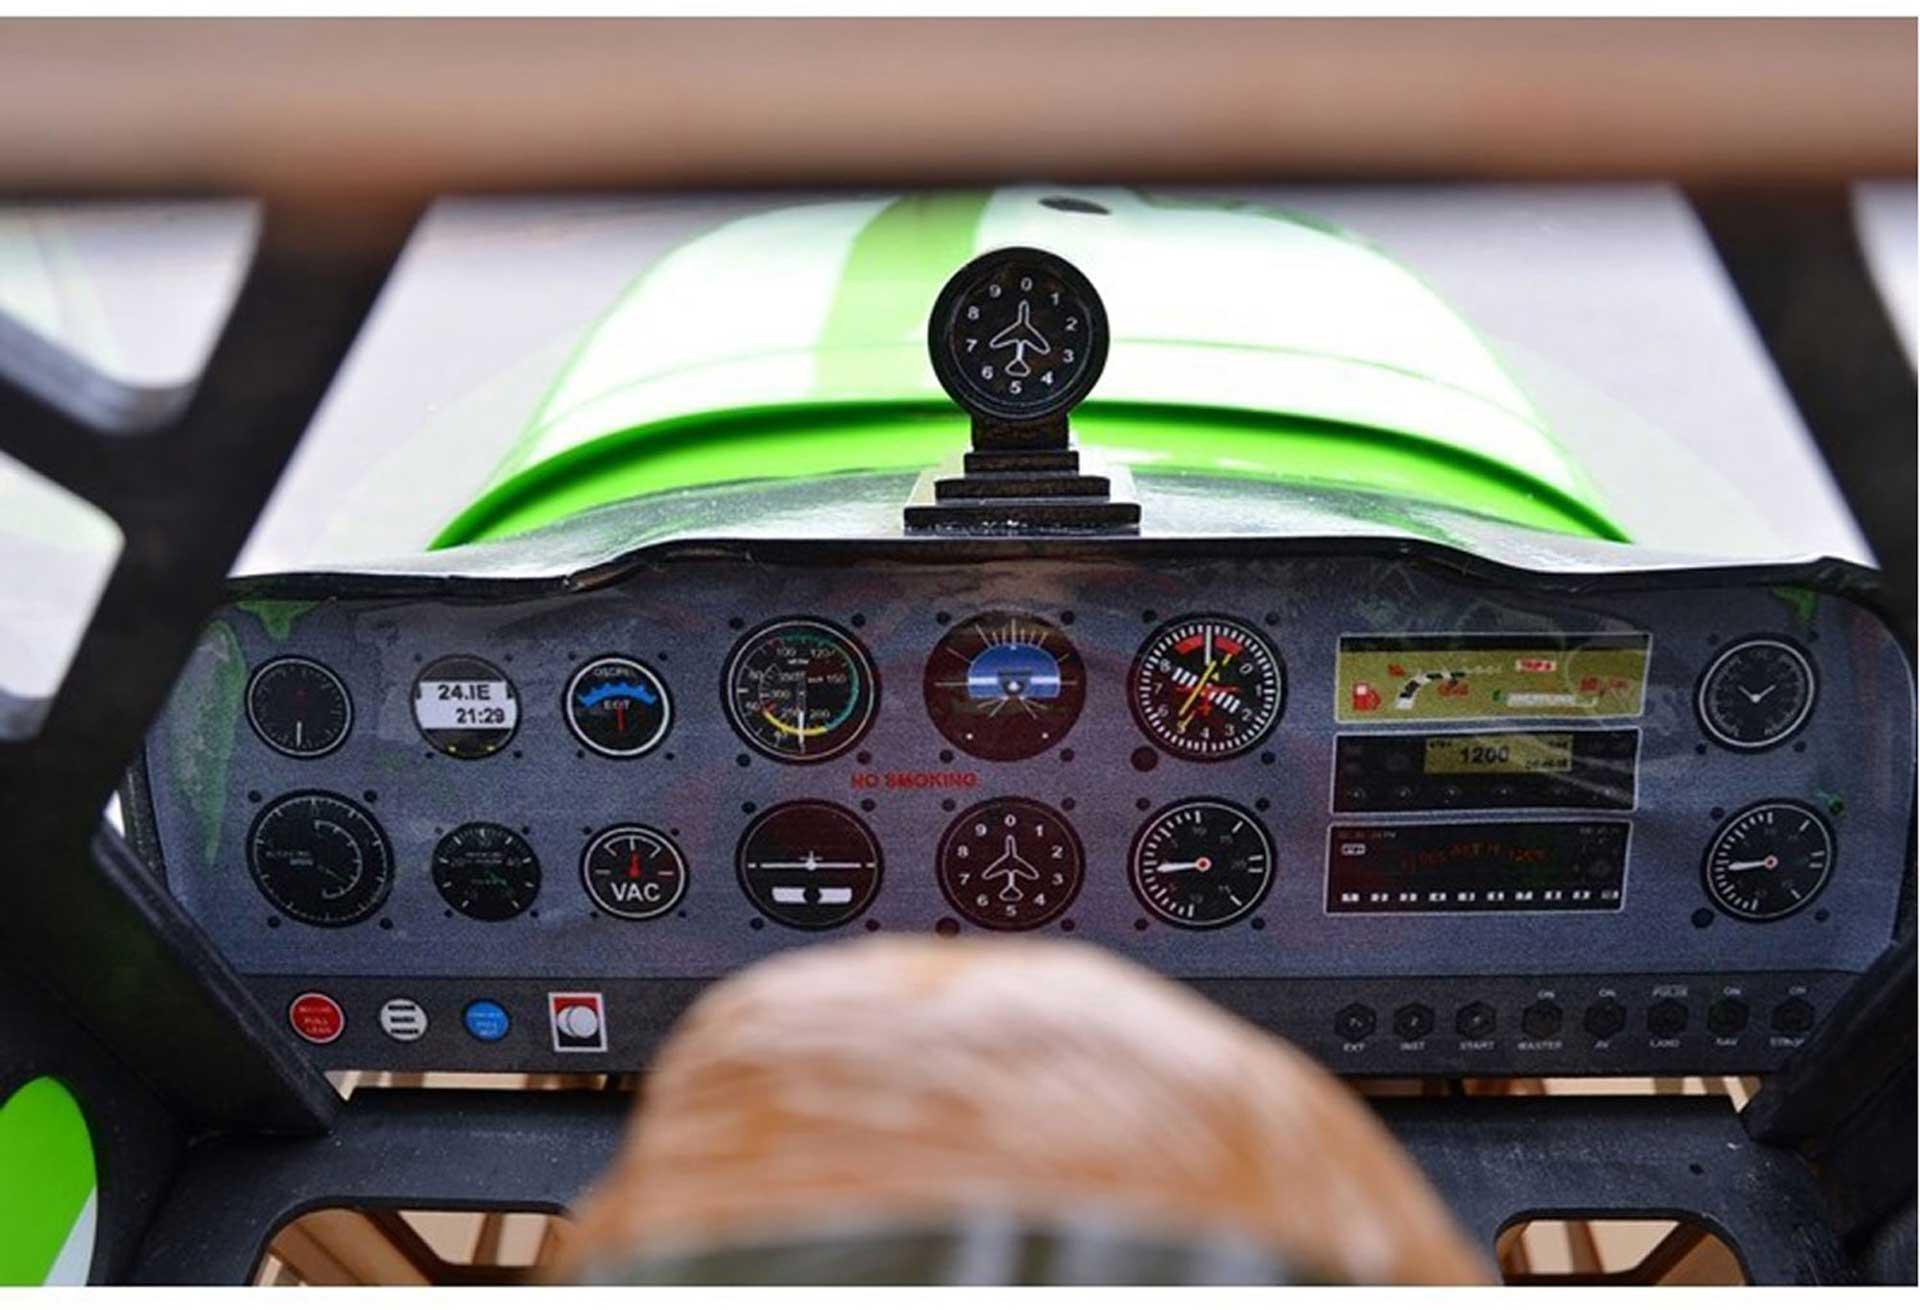 SG-MODELS DECATHLON 50CC 3D ARF GRÜN 3,1M